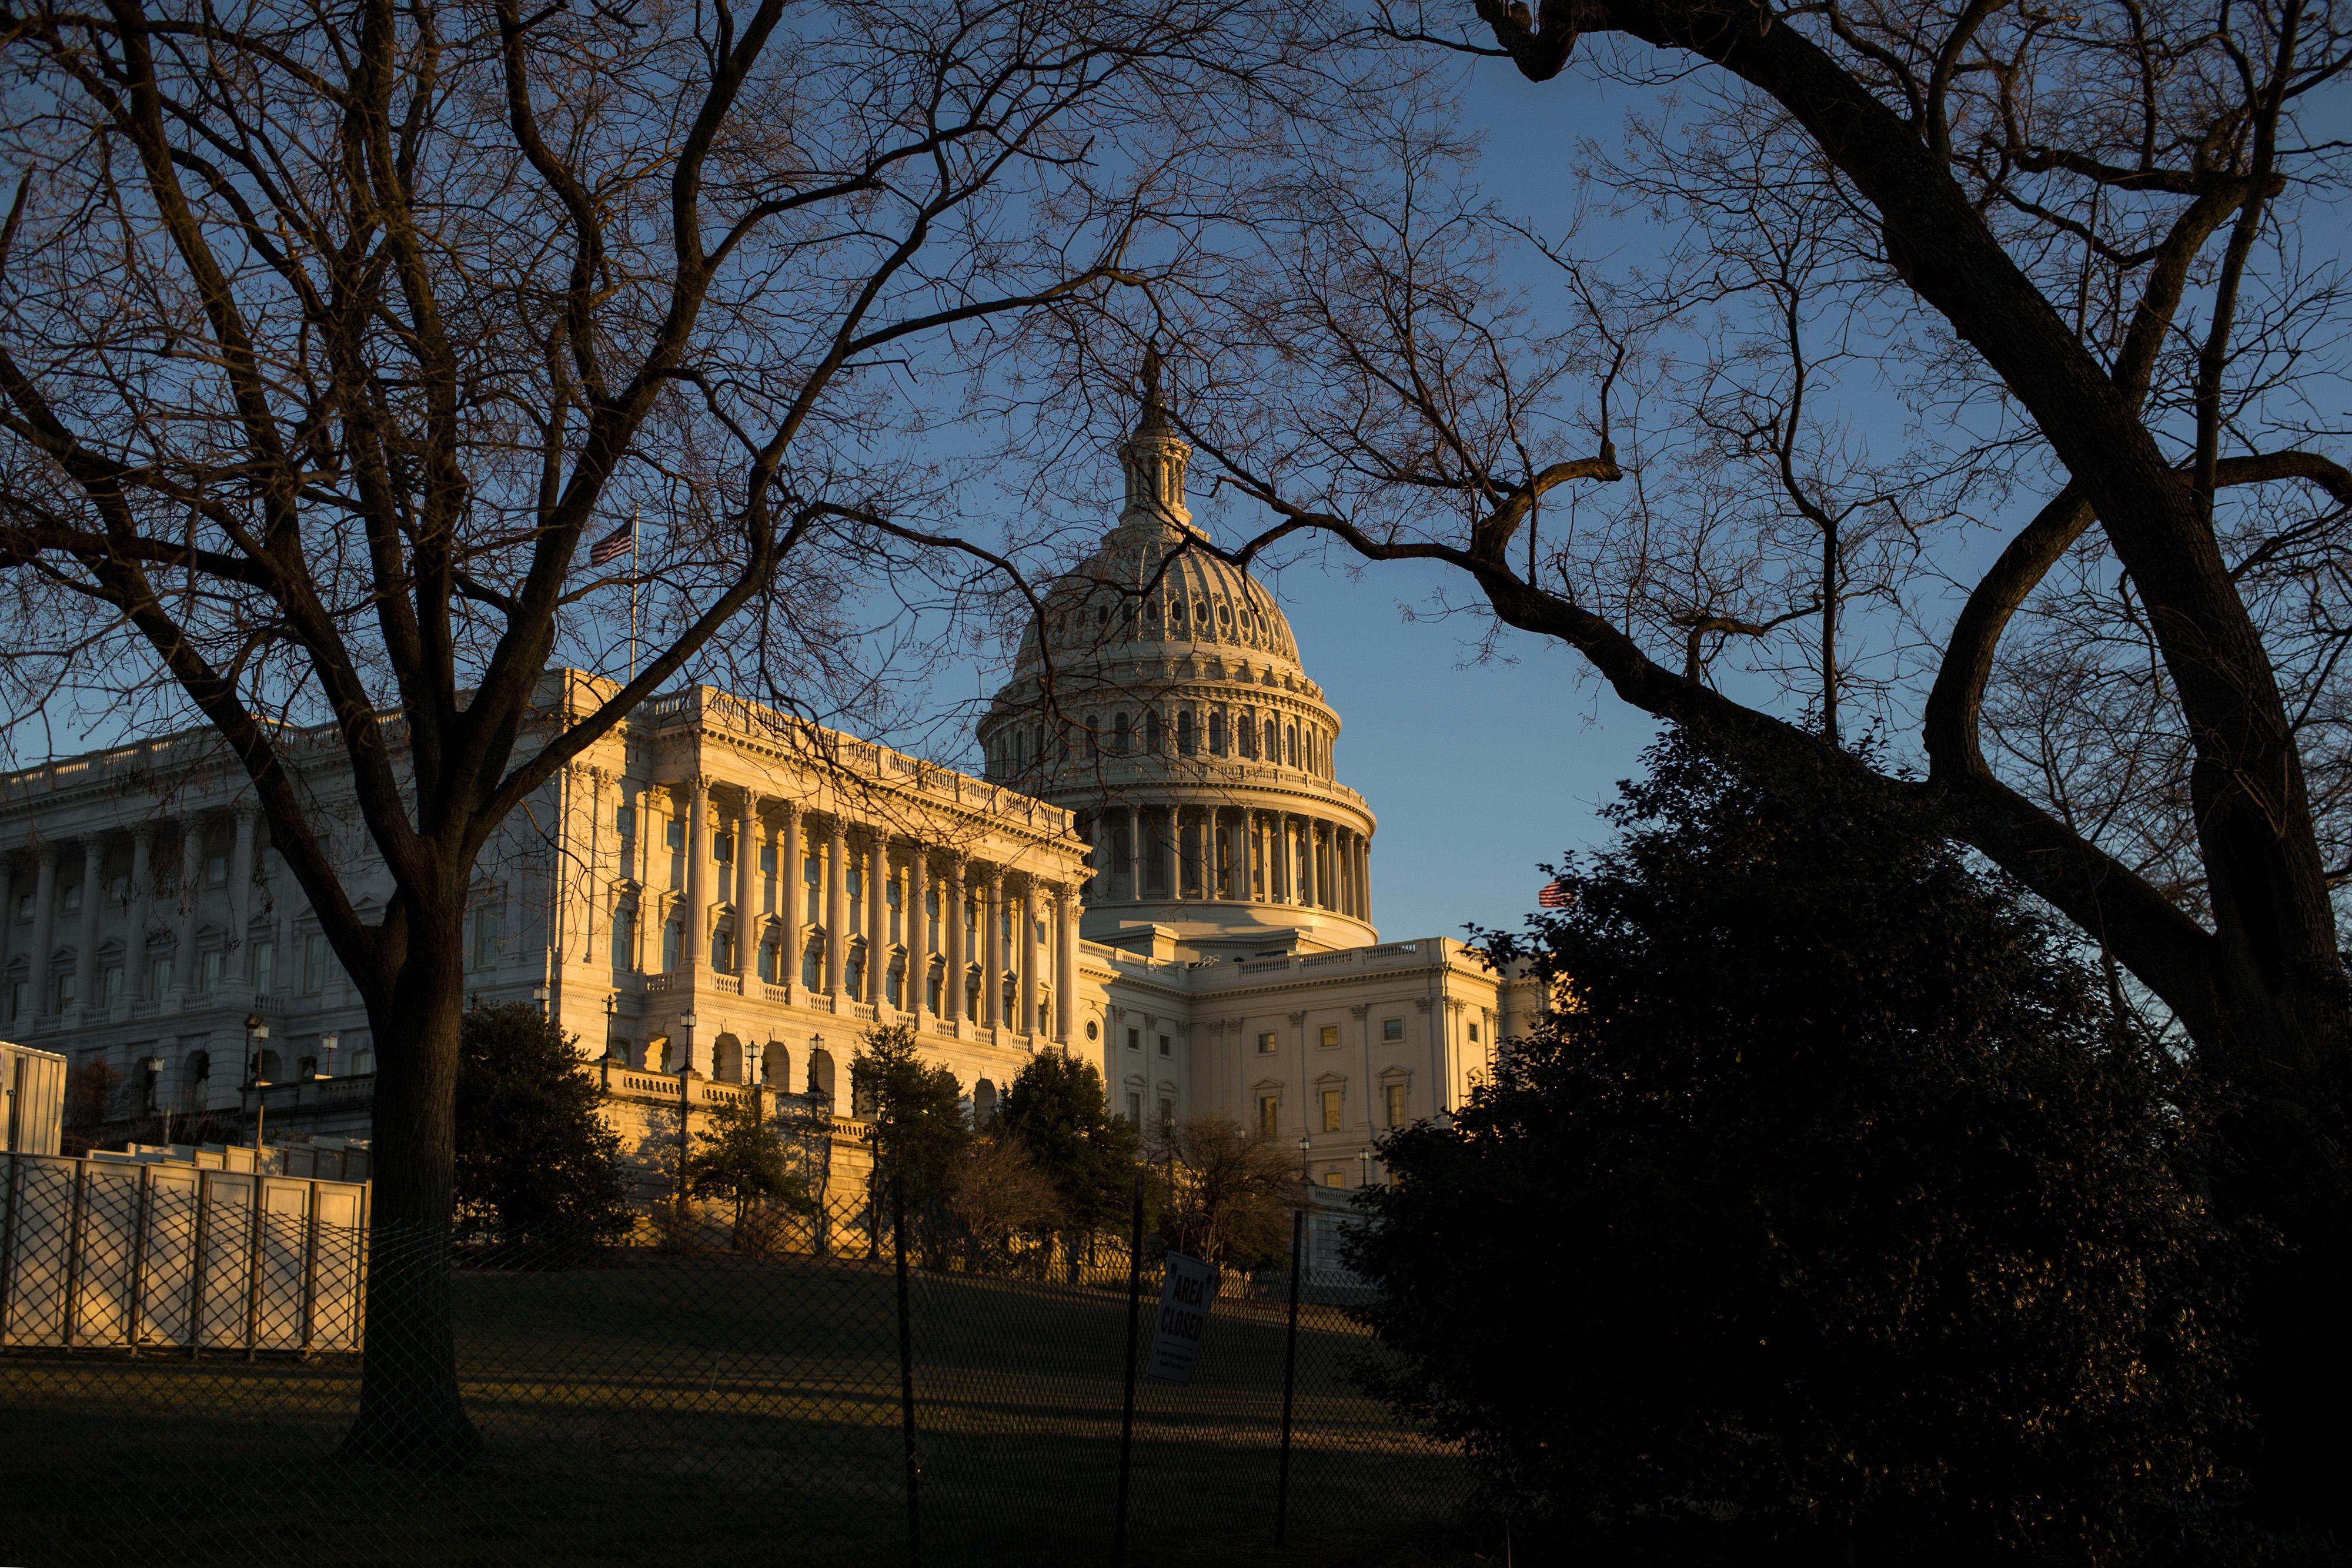 https://assets.sourcemedia.com/e7/90/8d2479bb44e68e448c7f1050b684/u.S.CapitolBuilding-Bloomberg.jpg